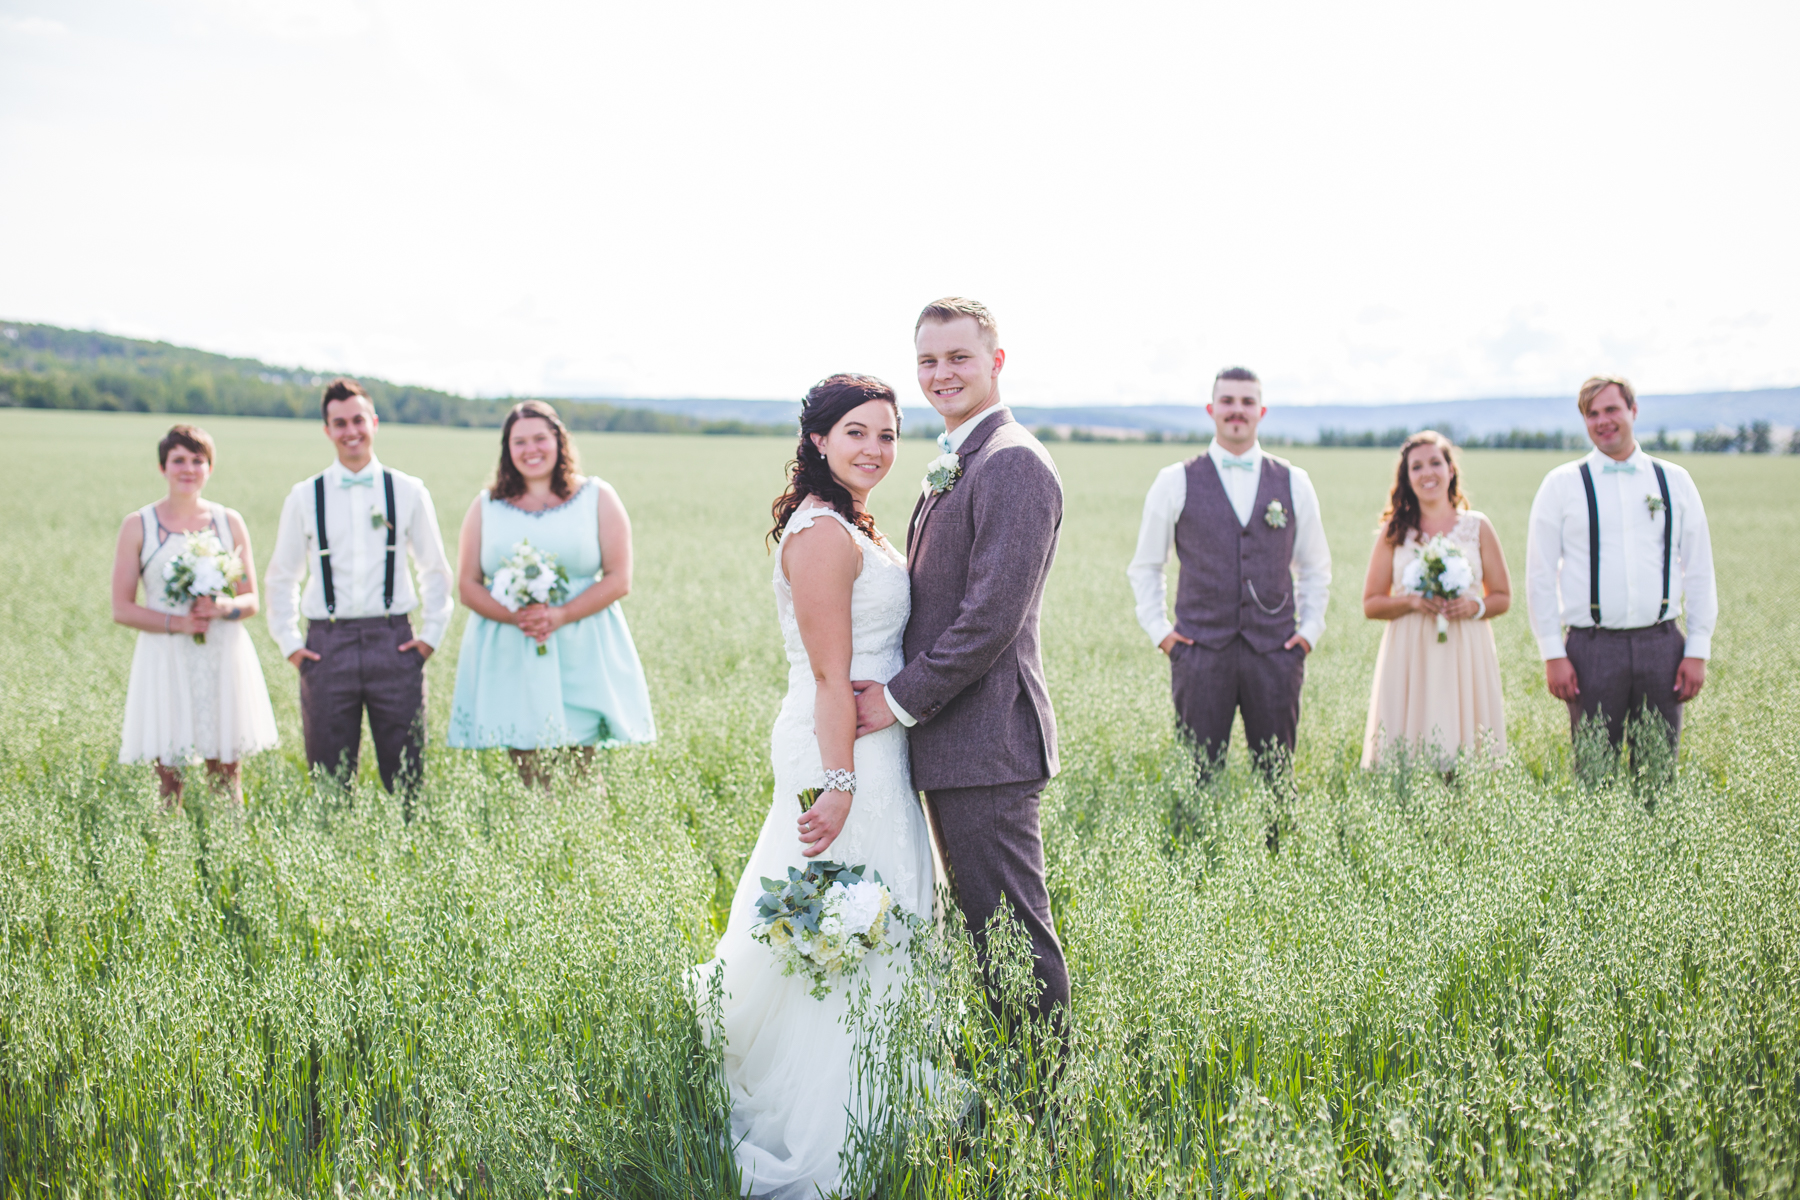 20150808-oglovewedding-923.jpg